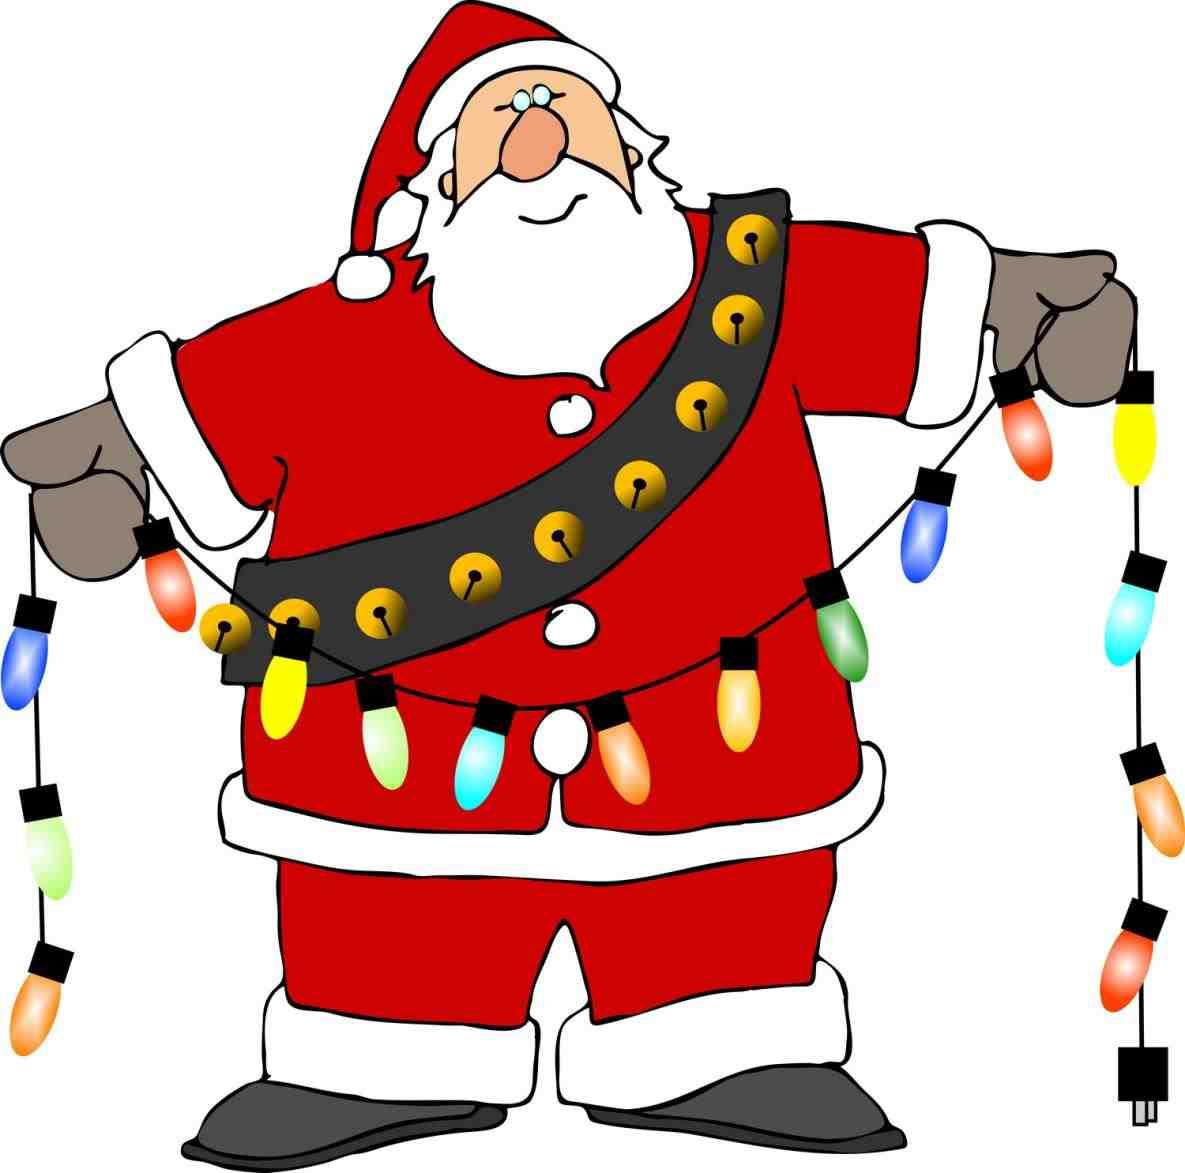 1185x1173 Christmas Lights On House Clipart Cheminee.website